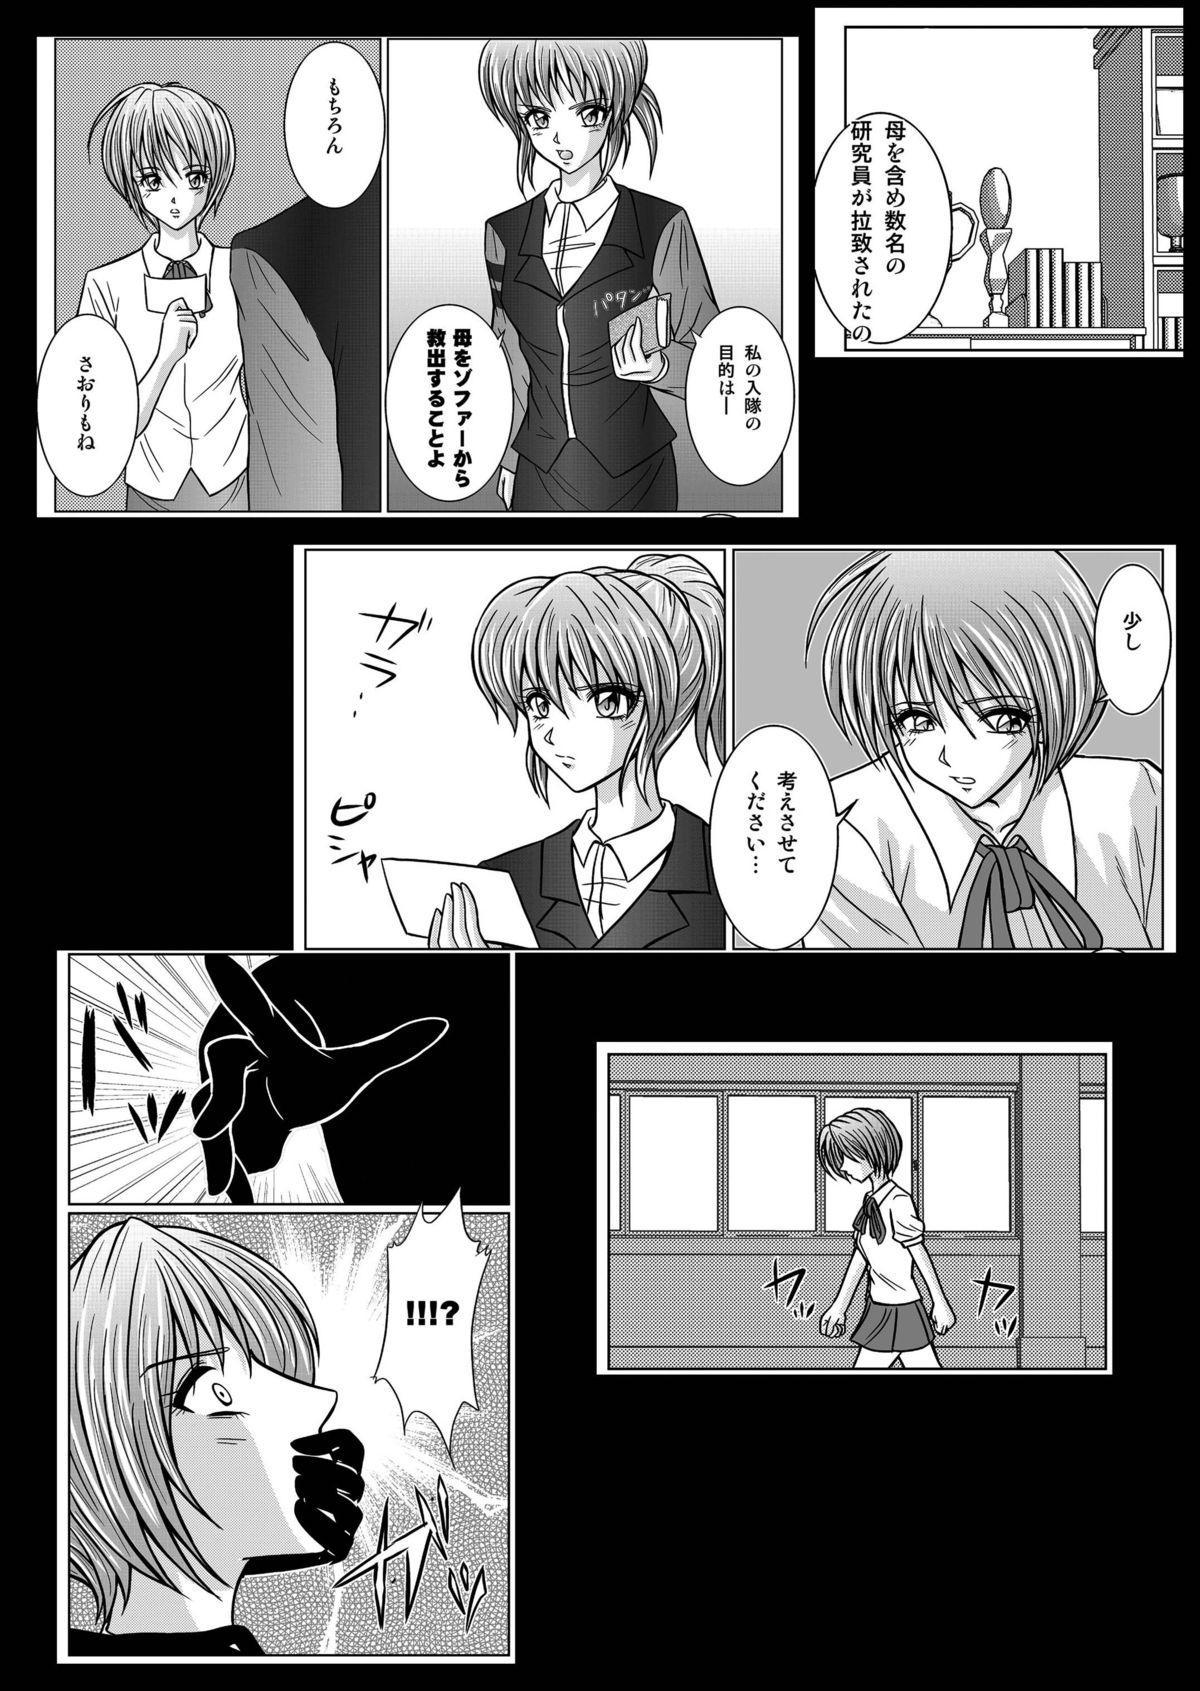 [Macxe's (monmon)] Tokubousentai Dinaranger ~Heroine Kairaku Sennou Keikaku~ Vol.01/02/03 (Renkaban) [Digital] 128